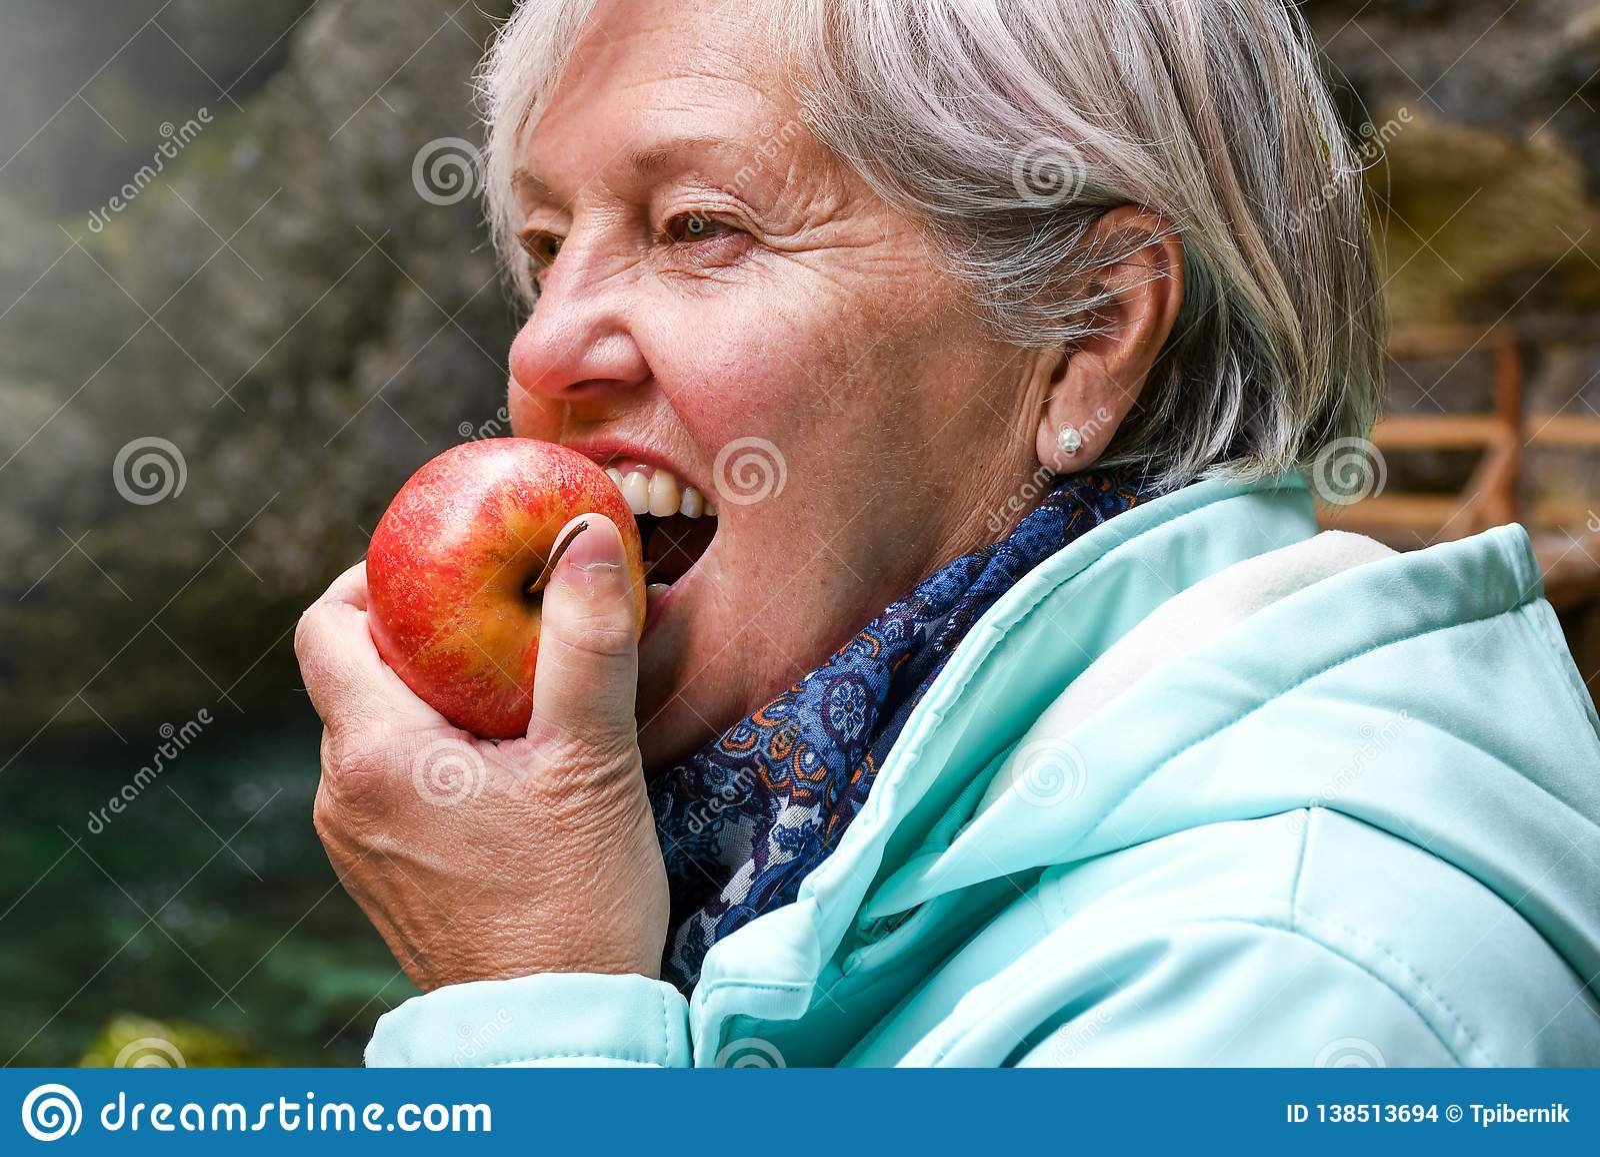 Senior woman eating apple outside in the park